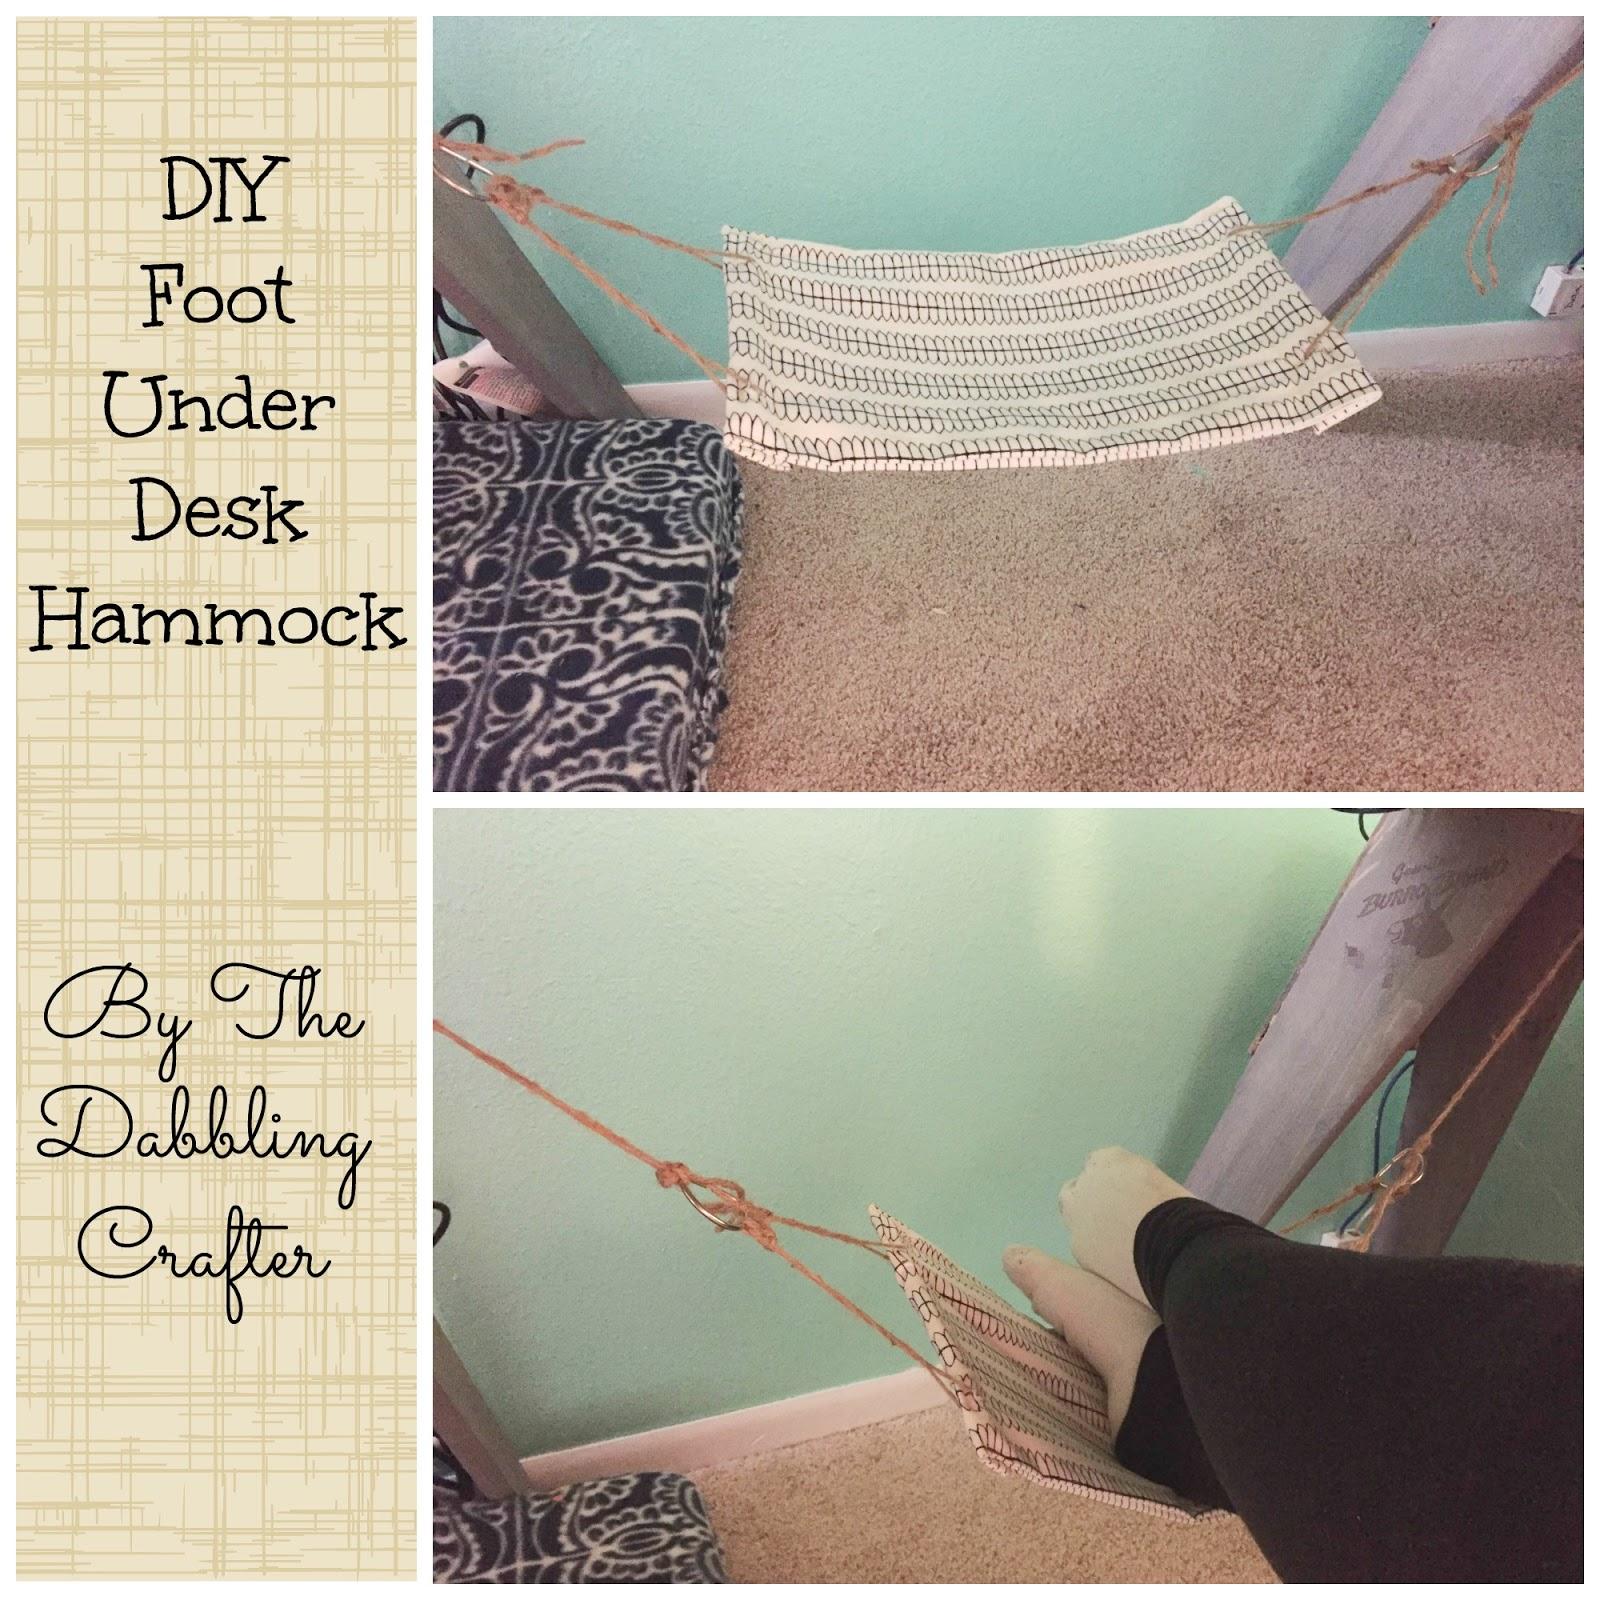 under chair cat hammock office jamaica the dabbling crafter diy sunday foot desk